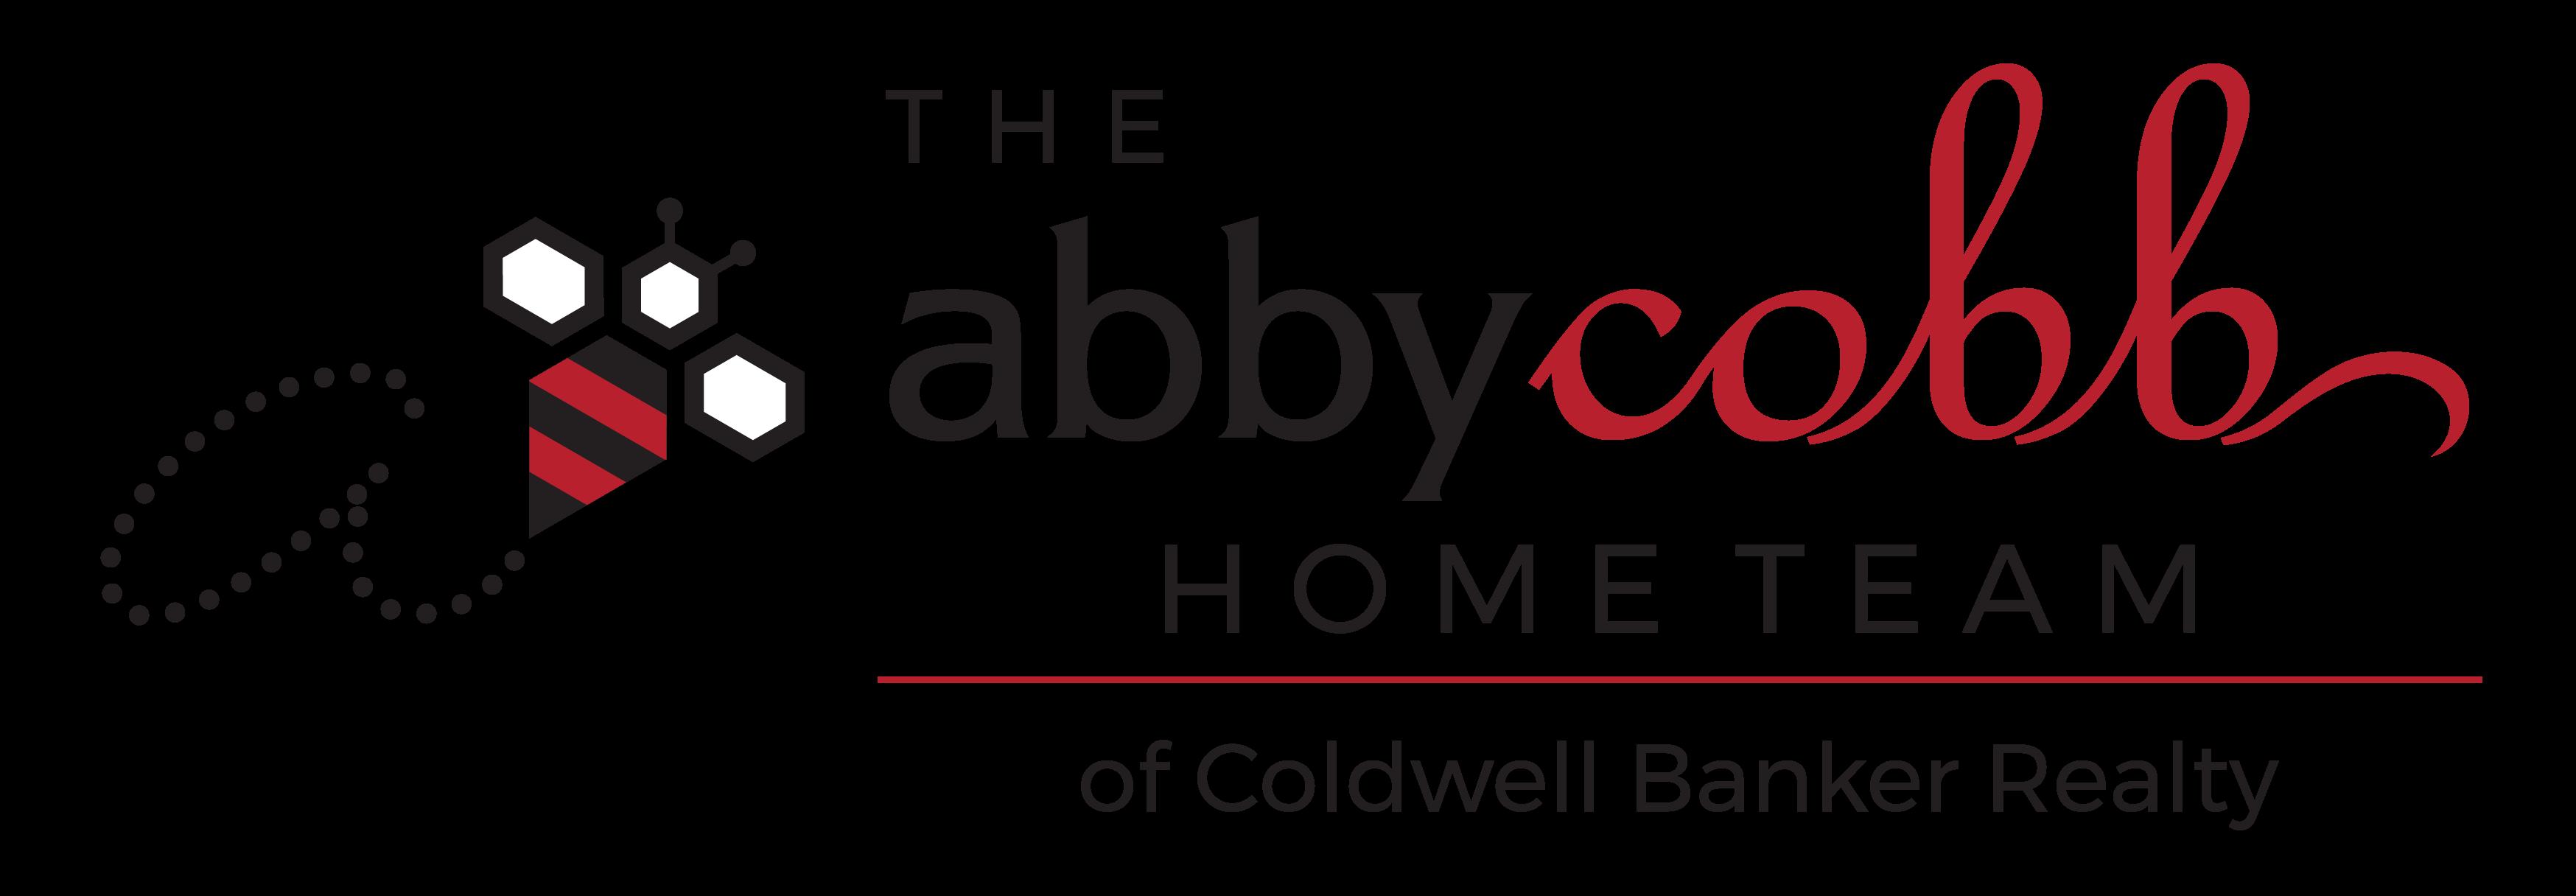 Abby Cobb, Maryland Realtor - abbycobbhomes.com